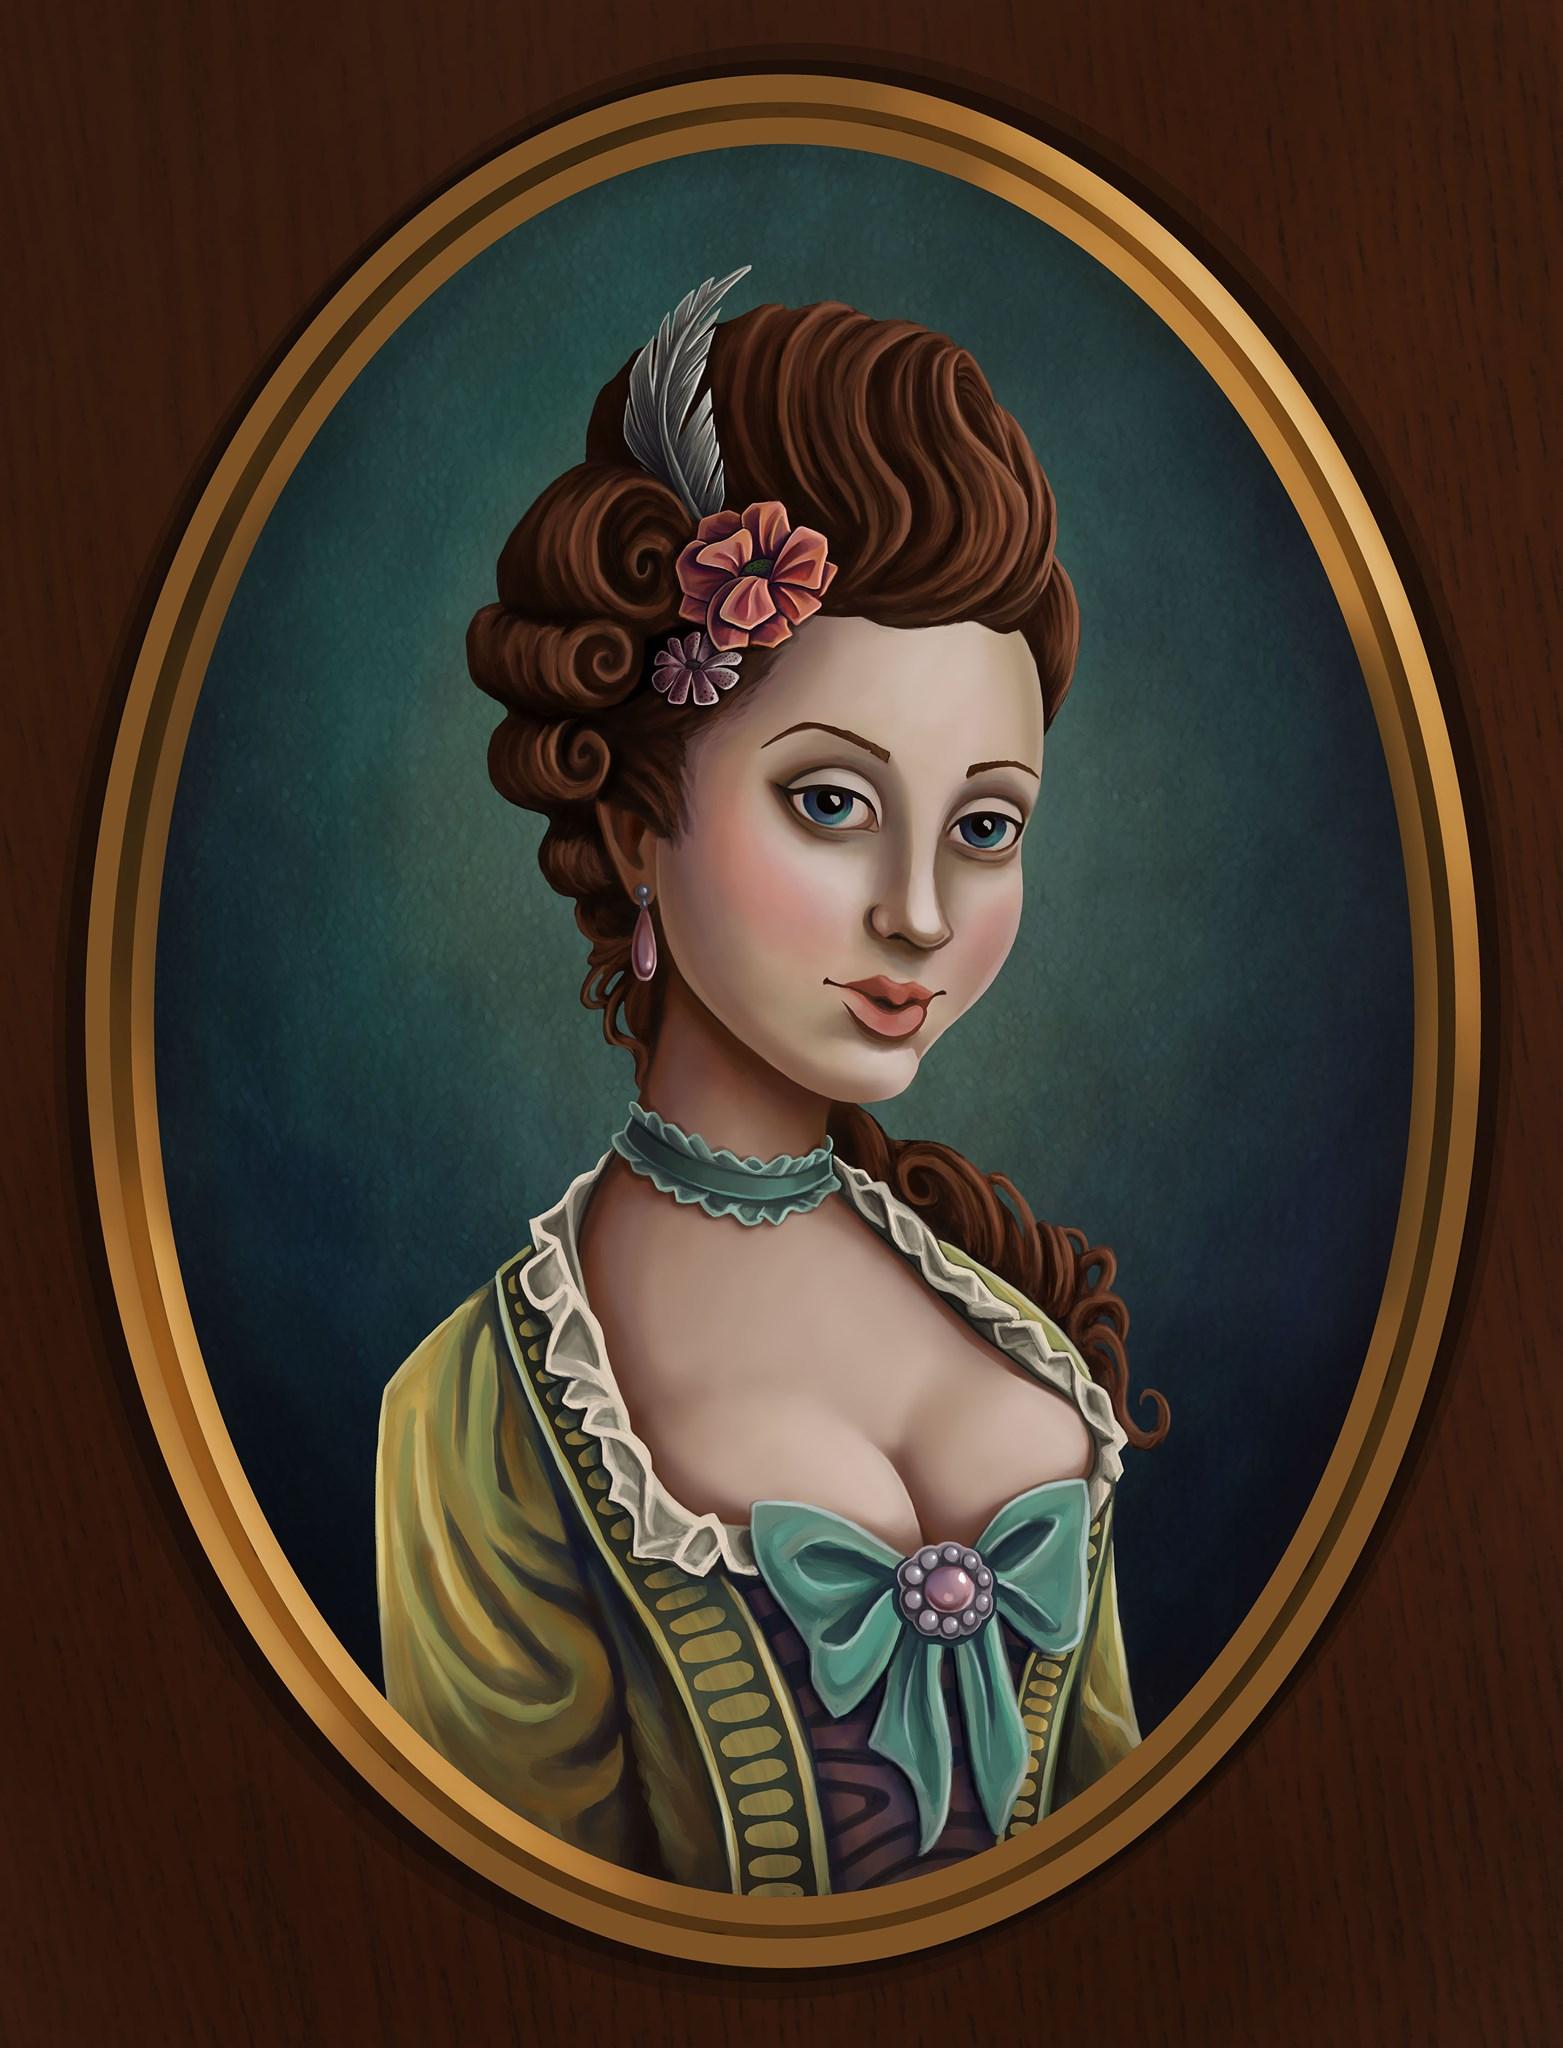 17th Century cameo portrait historical fashion Illustration.